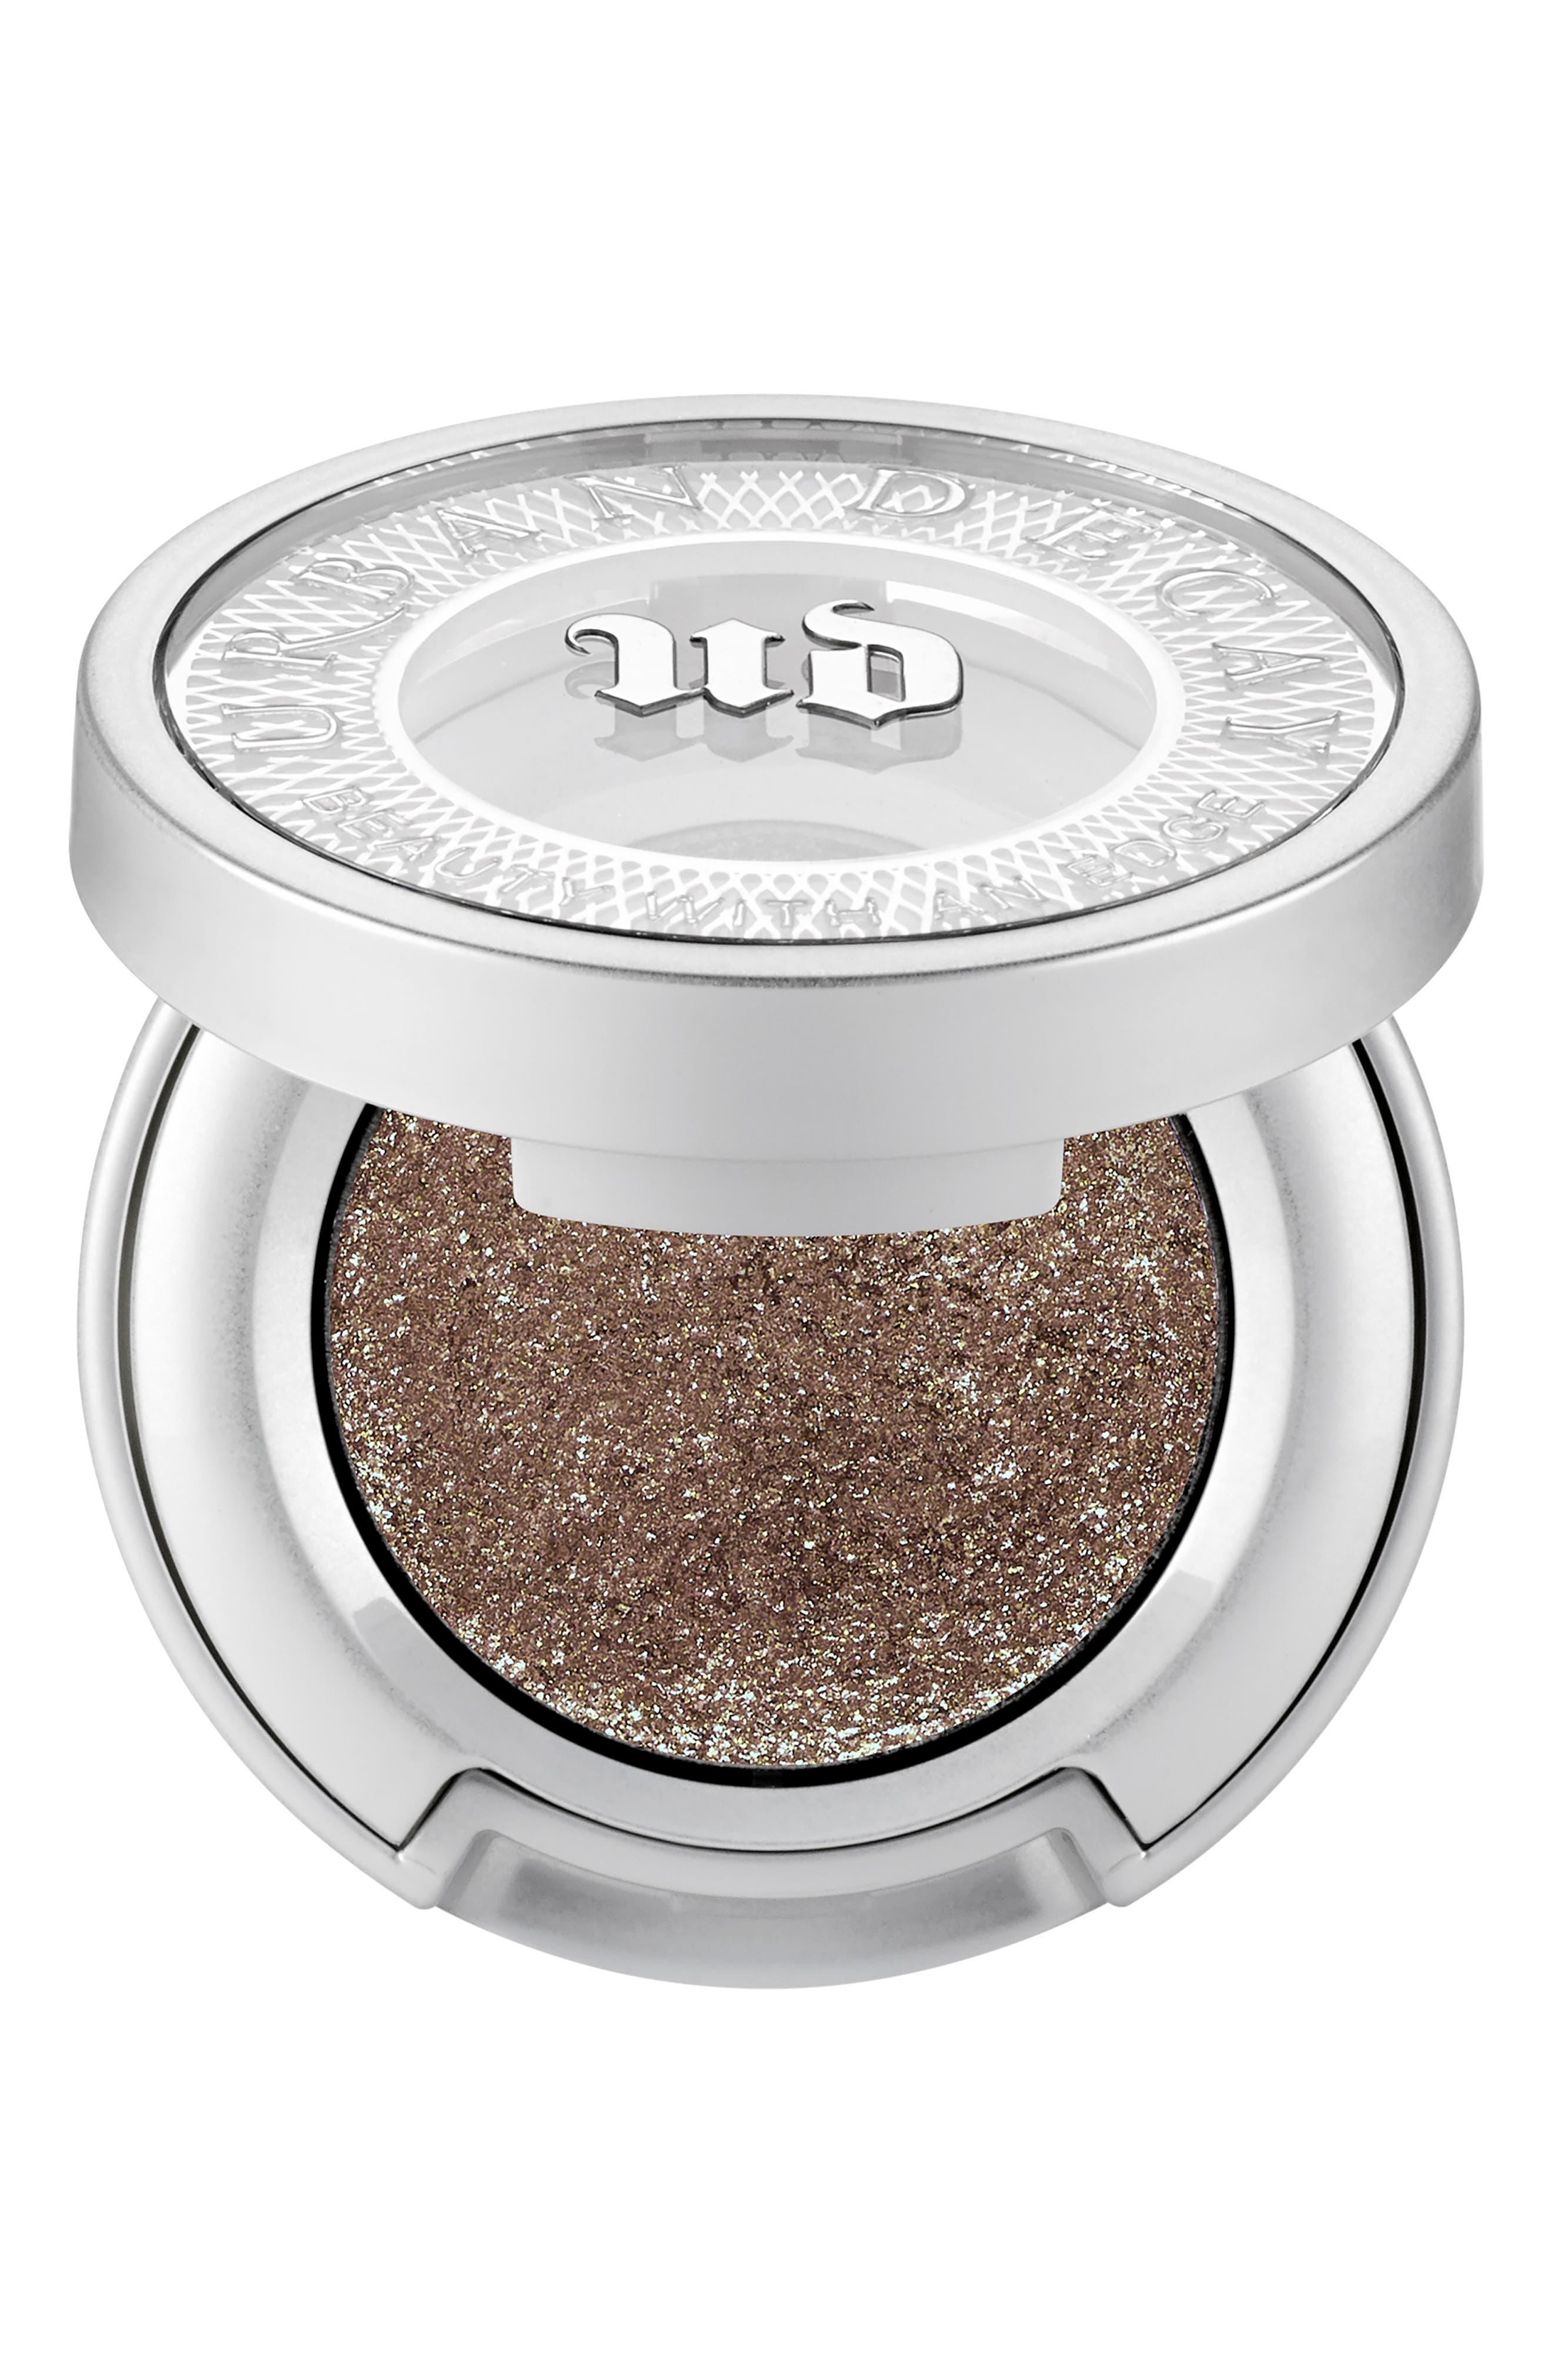 Image of Urban Decay Moondust Eyeshadow - Lithium